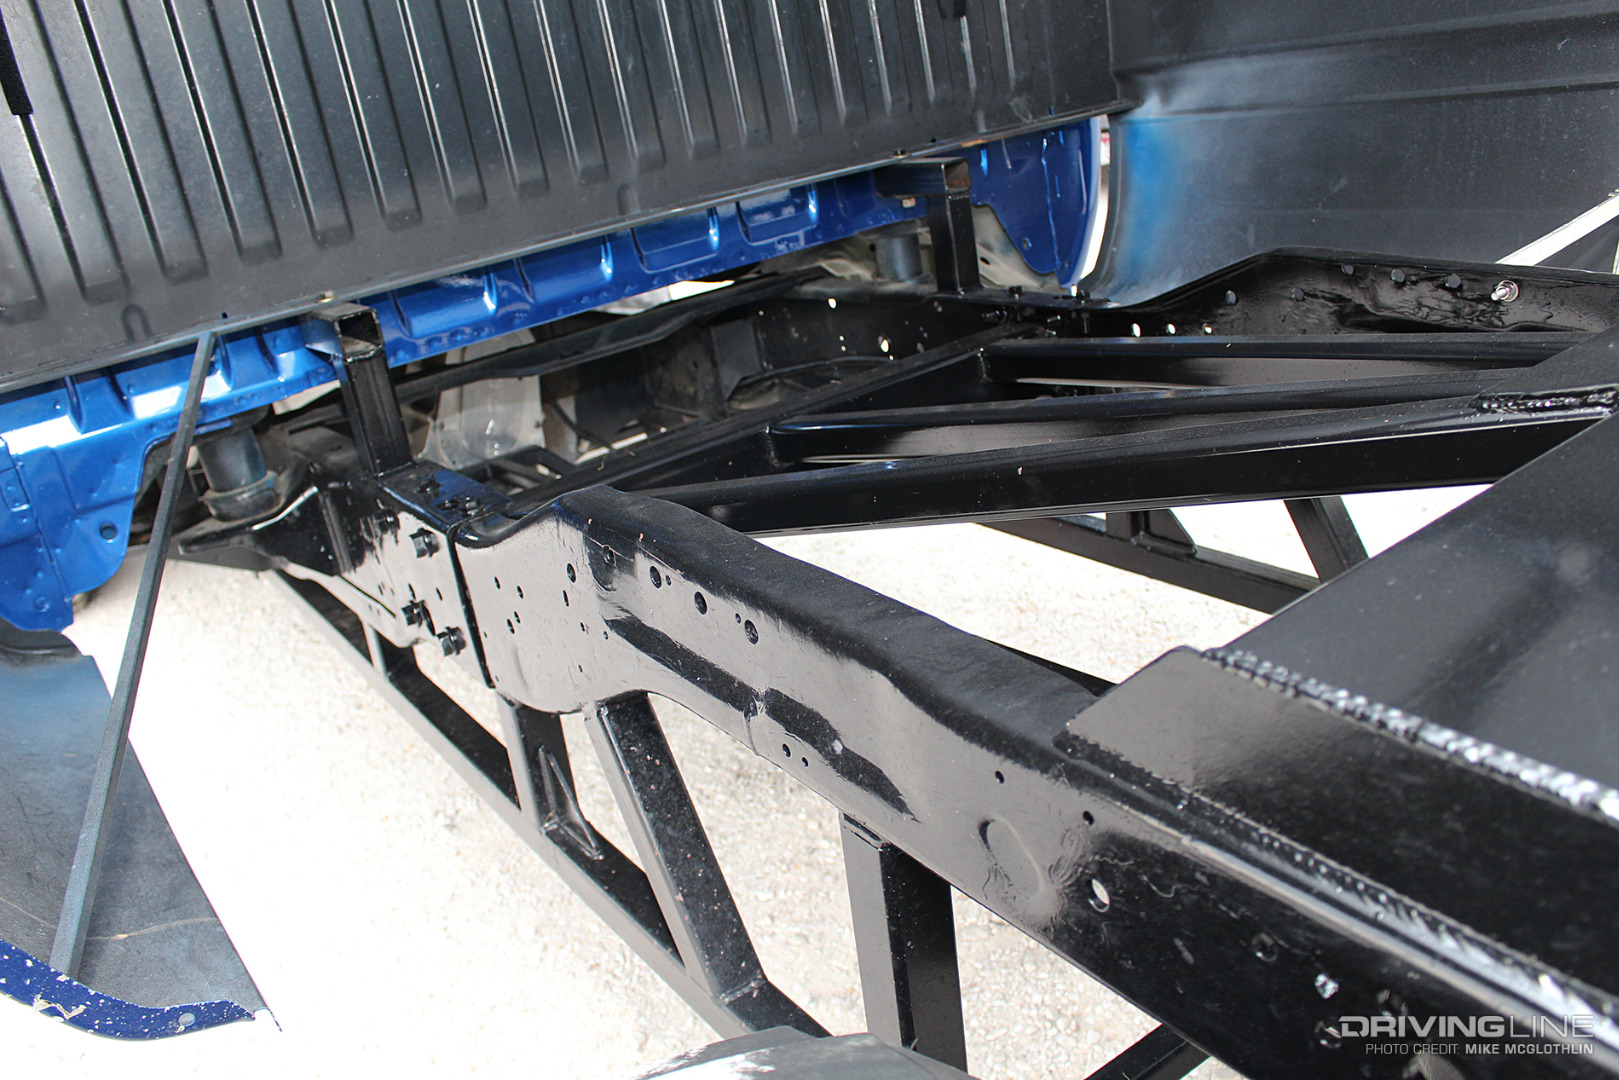 Anatomy of a Pro Stock Diesel Truck | DrivingLine